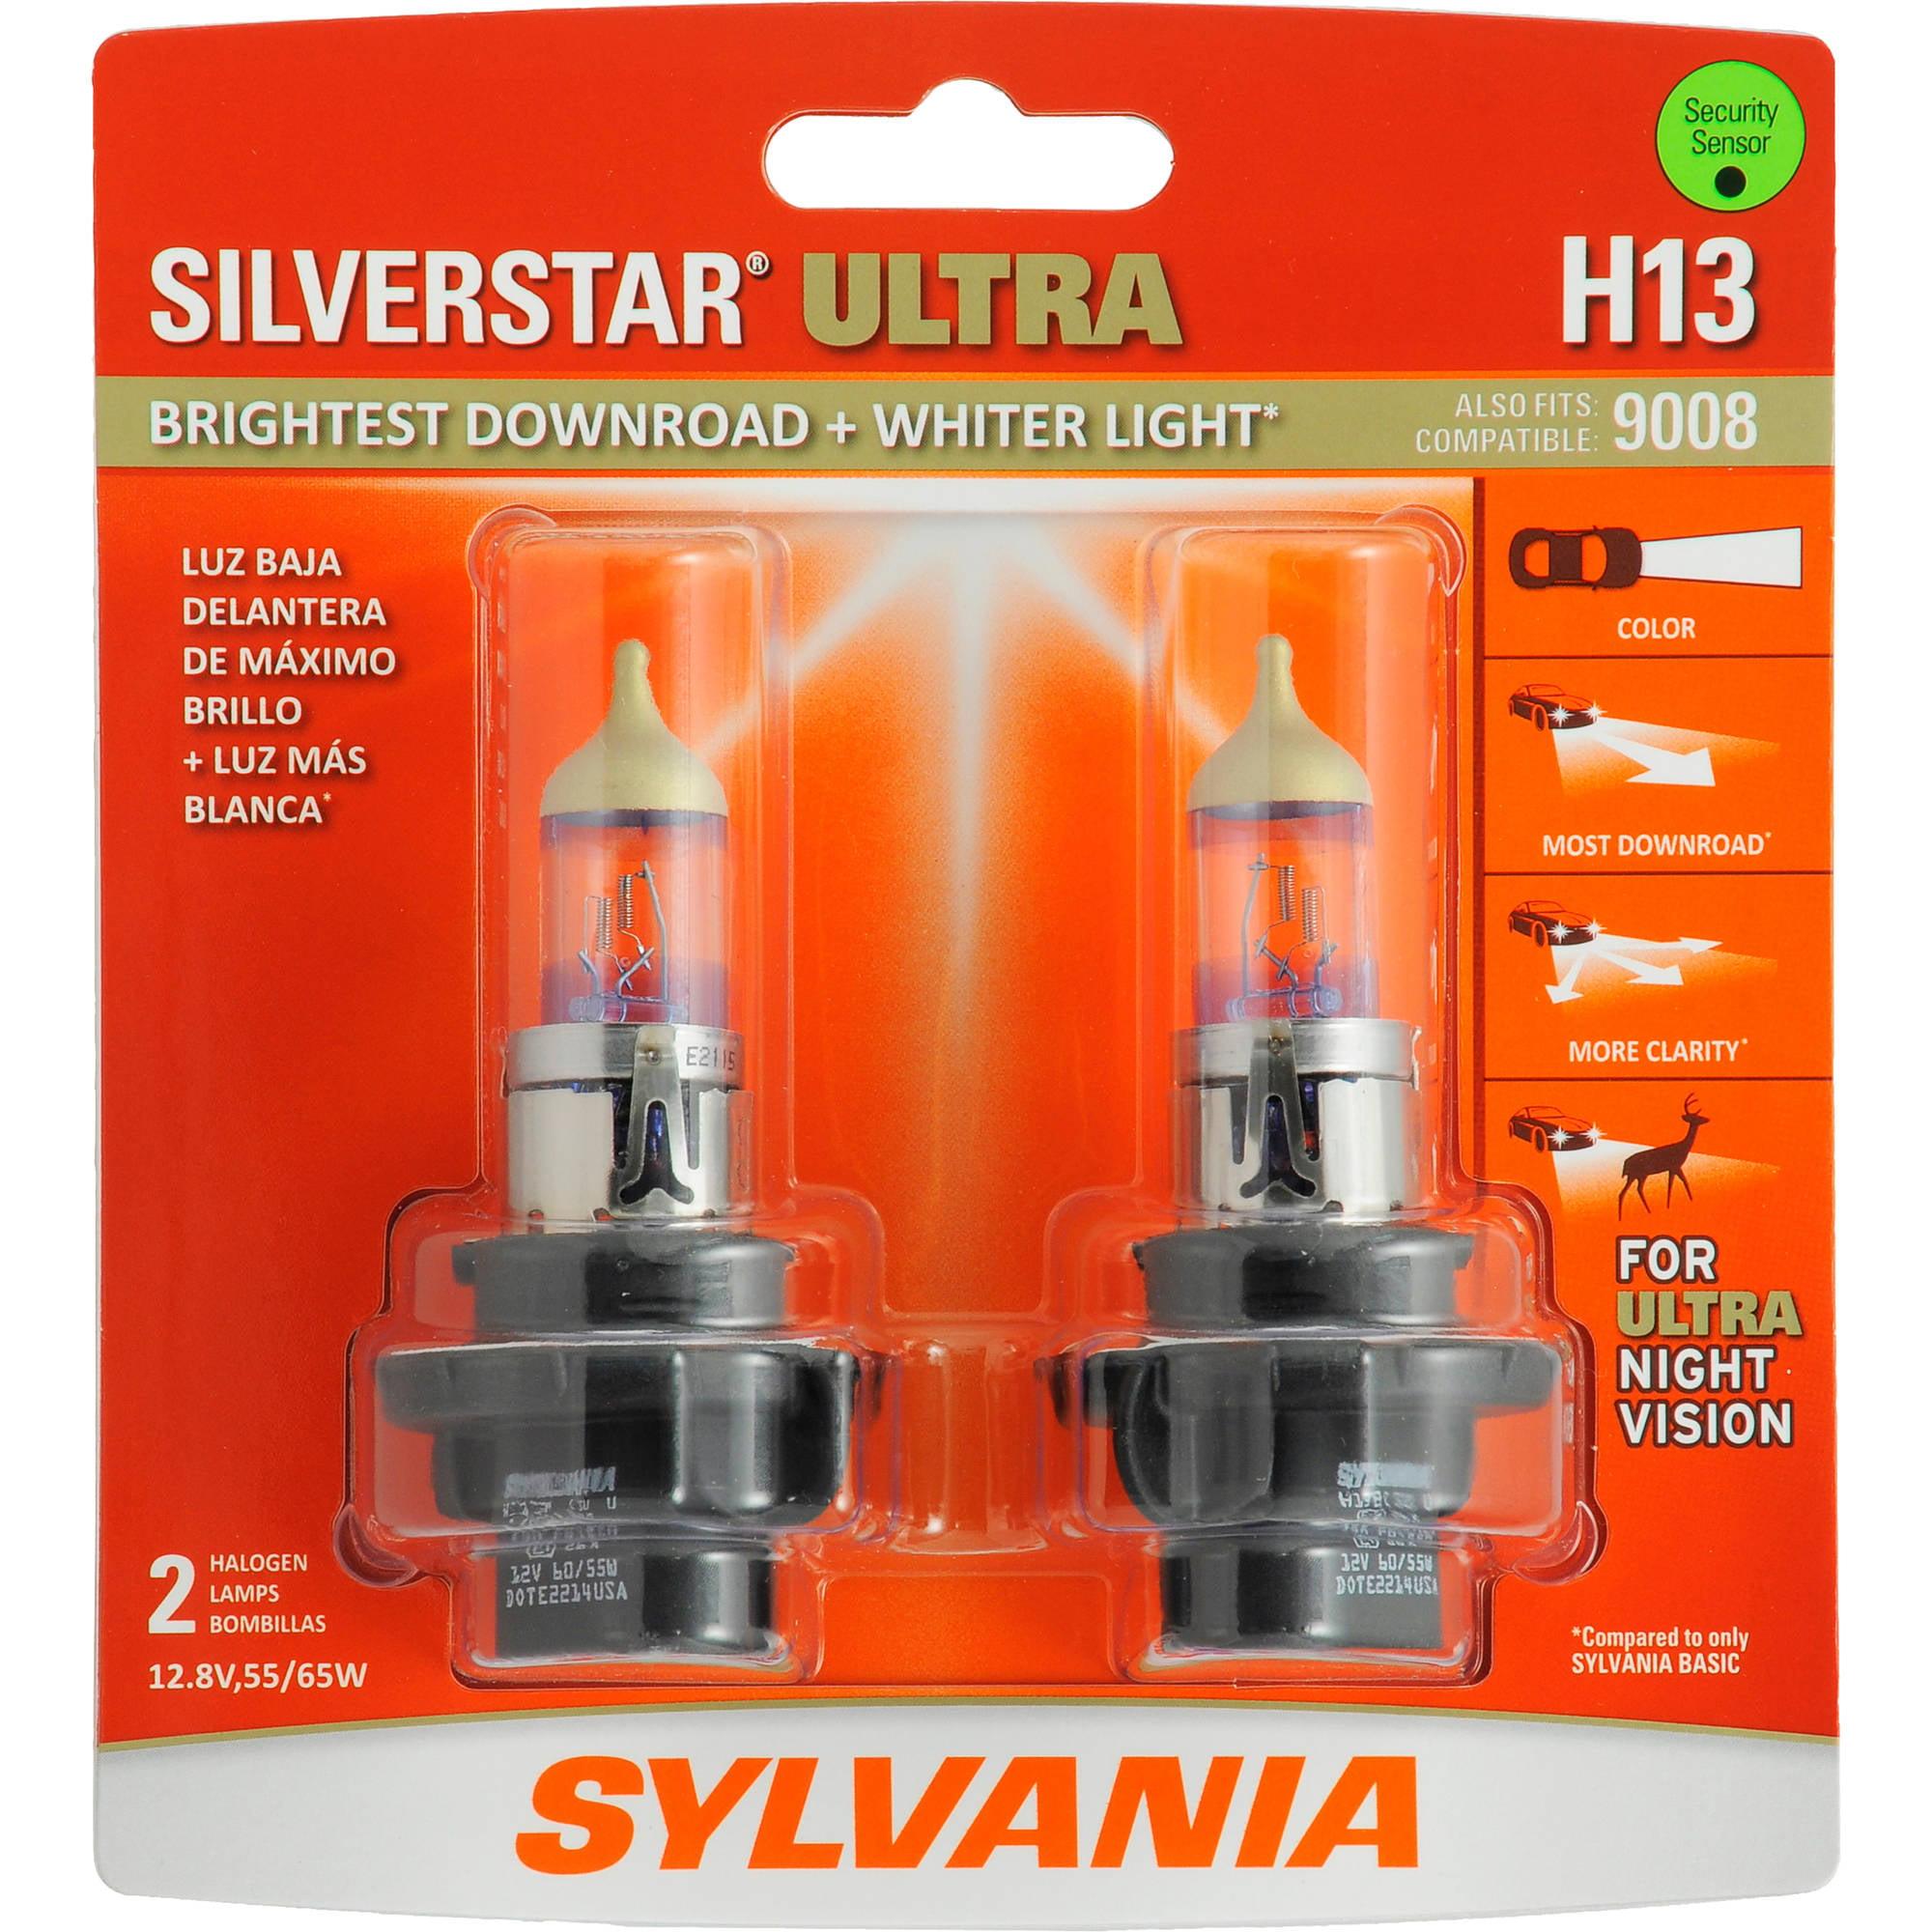 Sylvania Light Bulbs Customer Service: ,Lighting